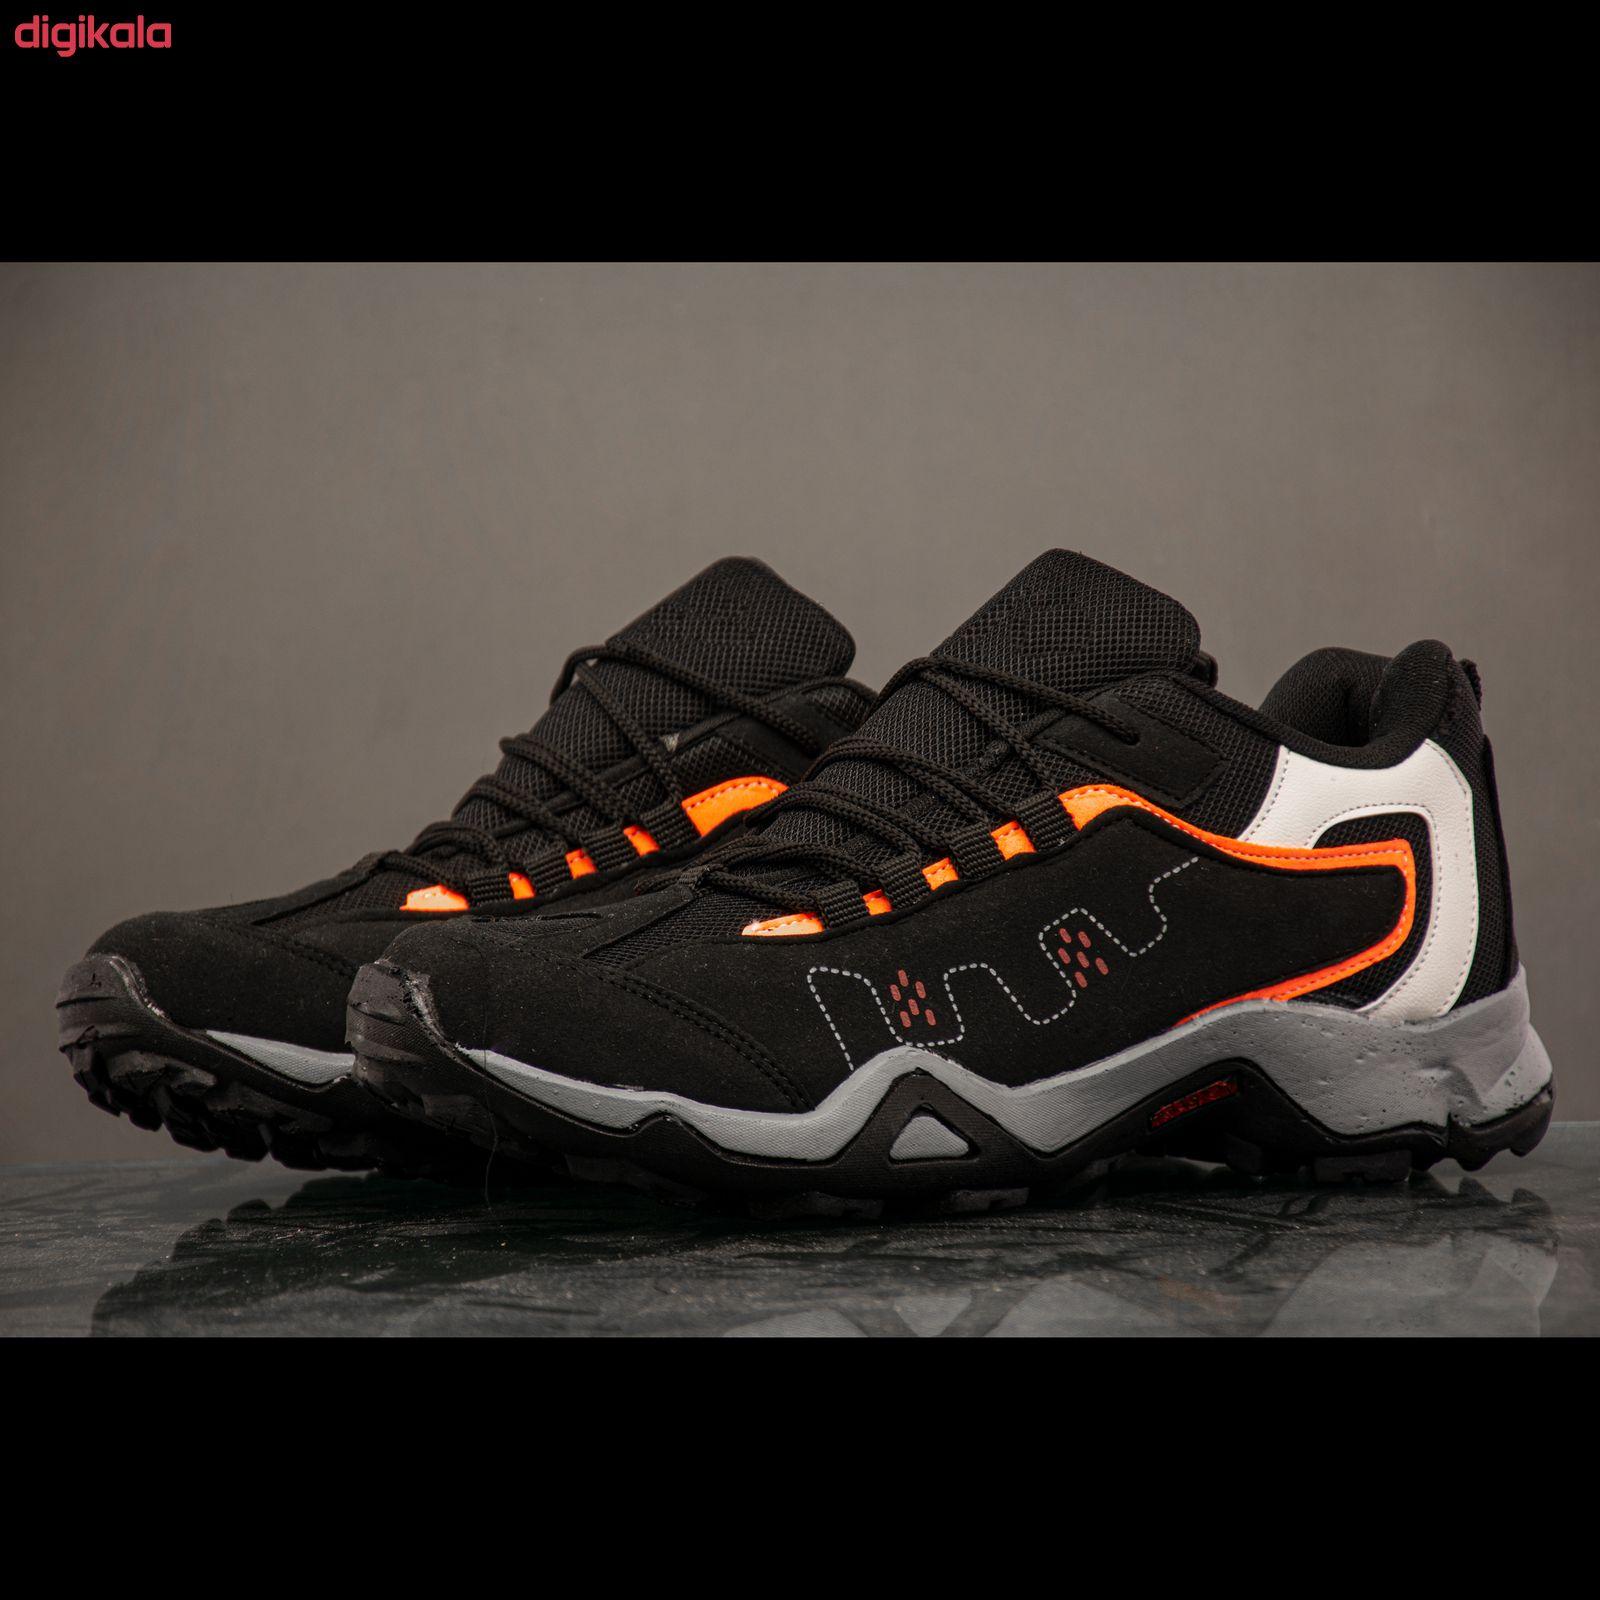 کفش کوهنوردی مردانه سارزی مدل hilas_M.e.s,Na.r.n.j_01 main 1 1